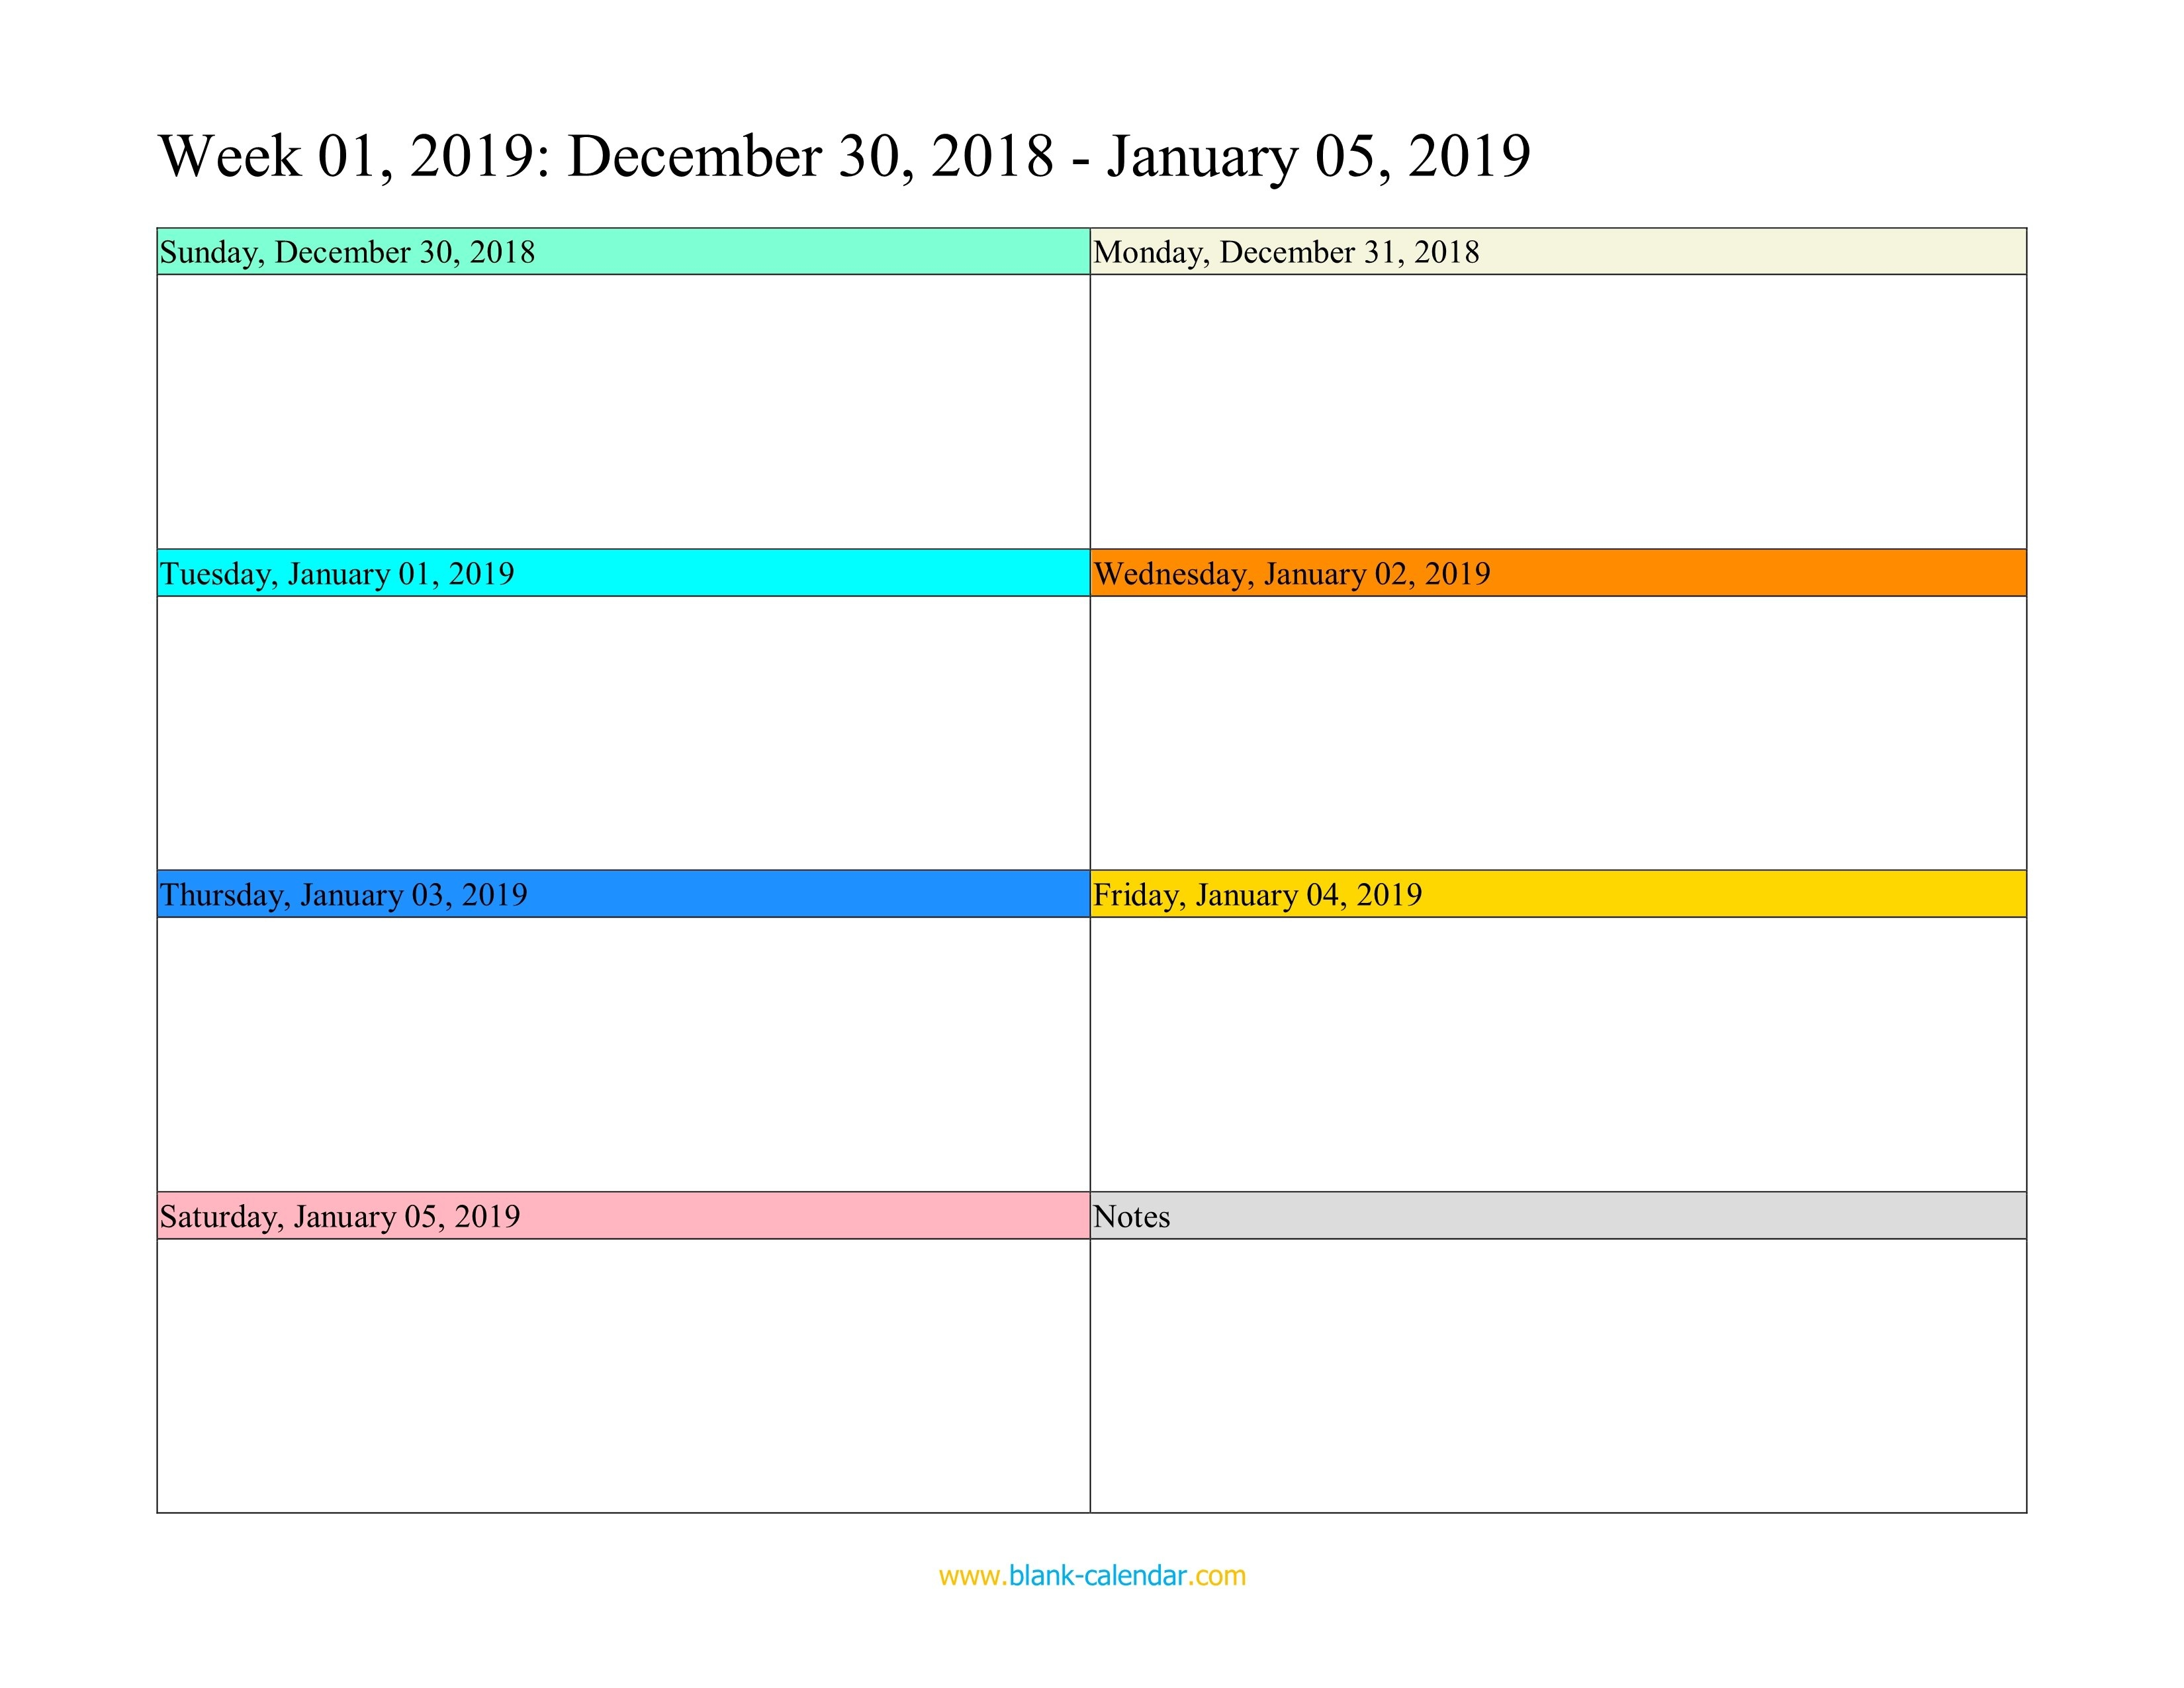 Weekly Calendar 2019 (Word, Excel, Pdf) Calendar 01/2019